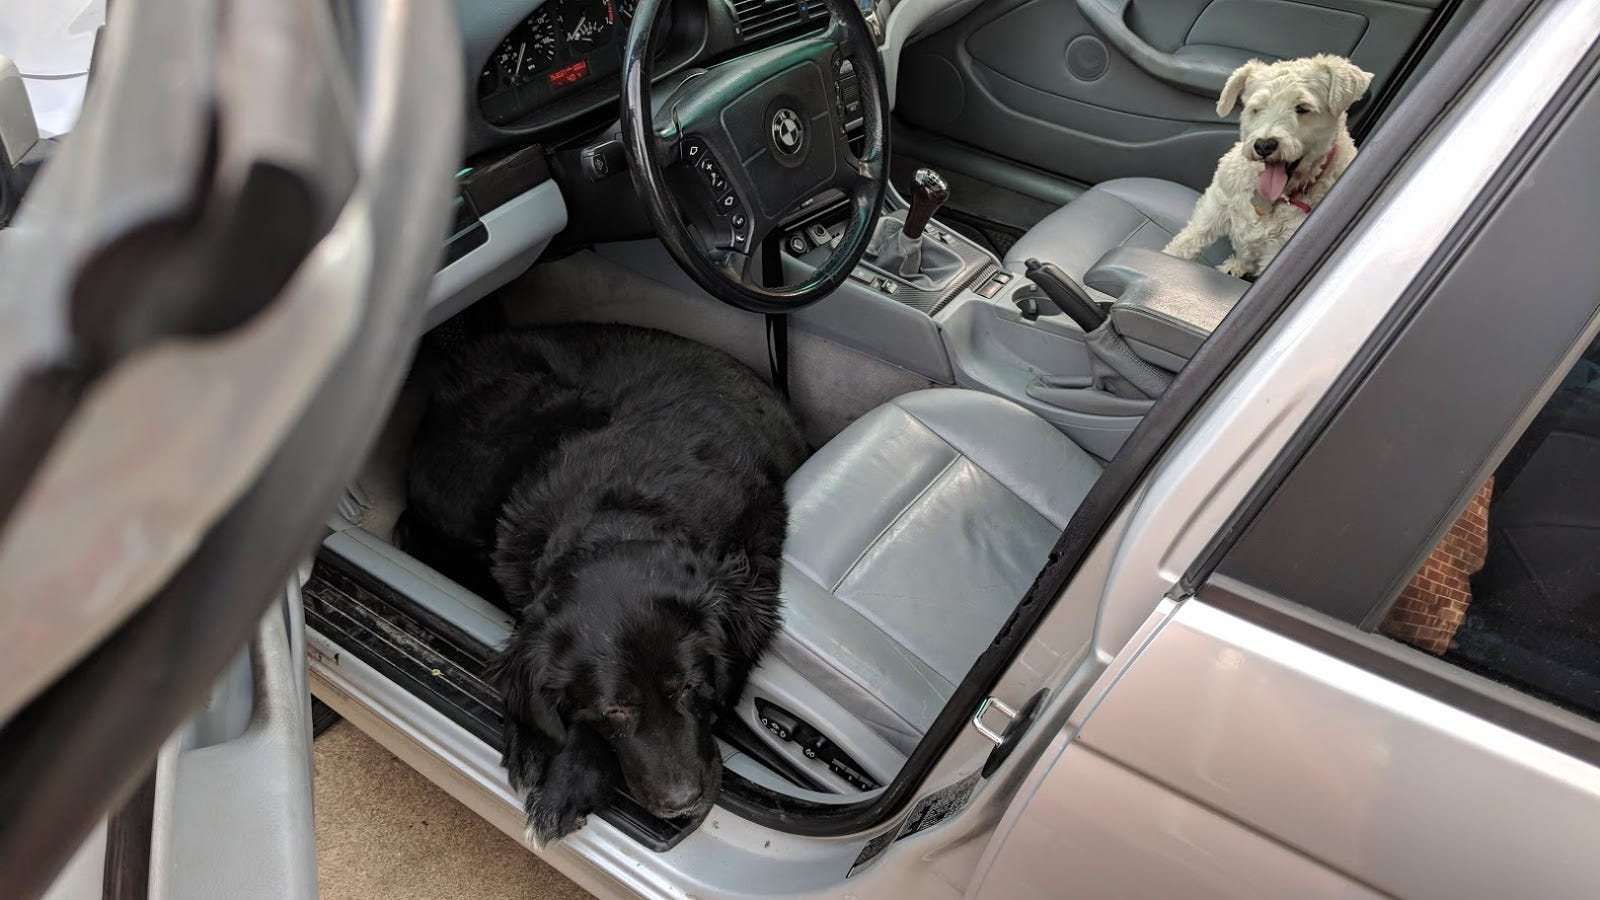 Doggos love manuals.